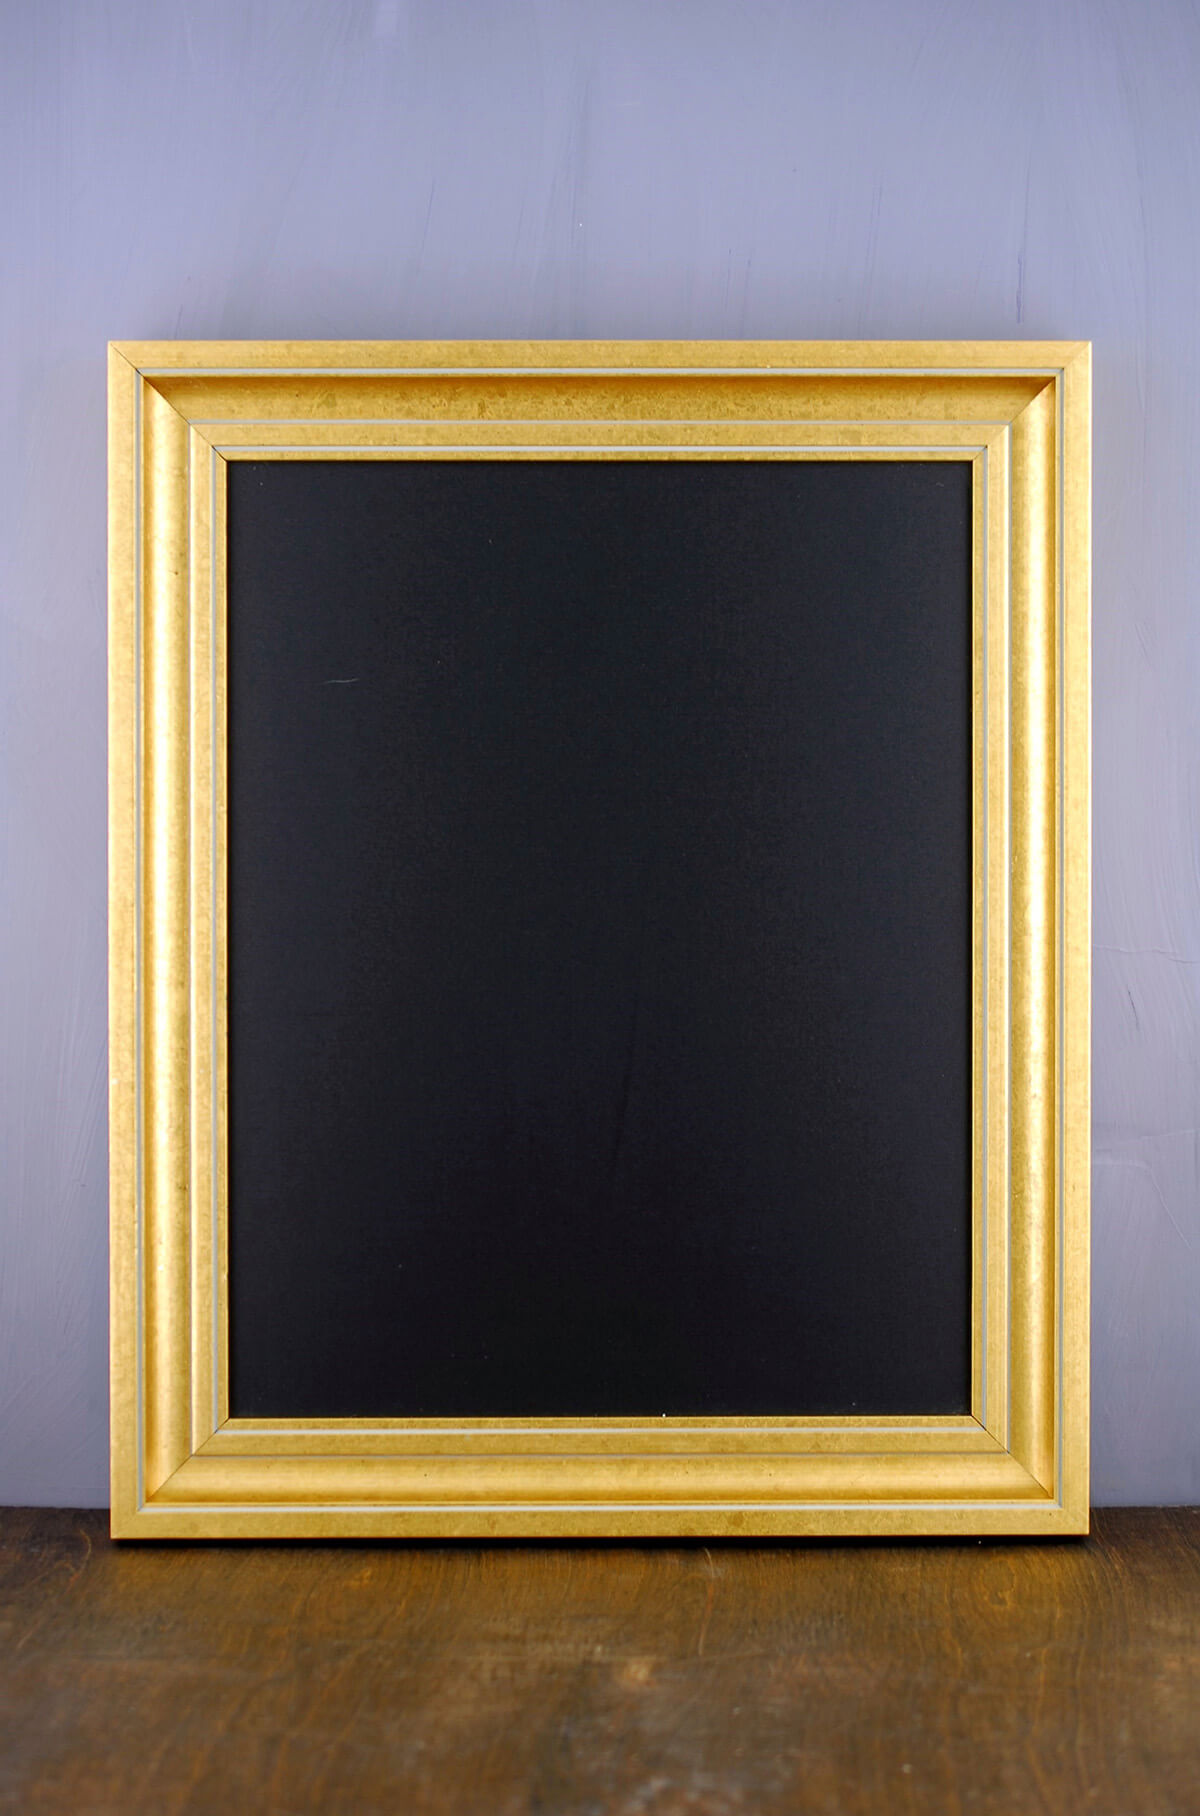 Gold Framed 11x14 Chalkboard